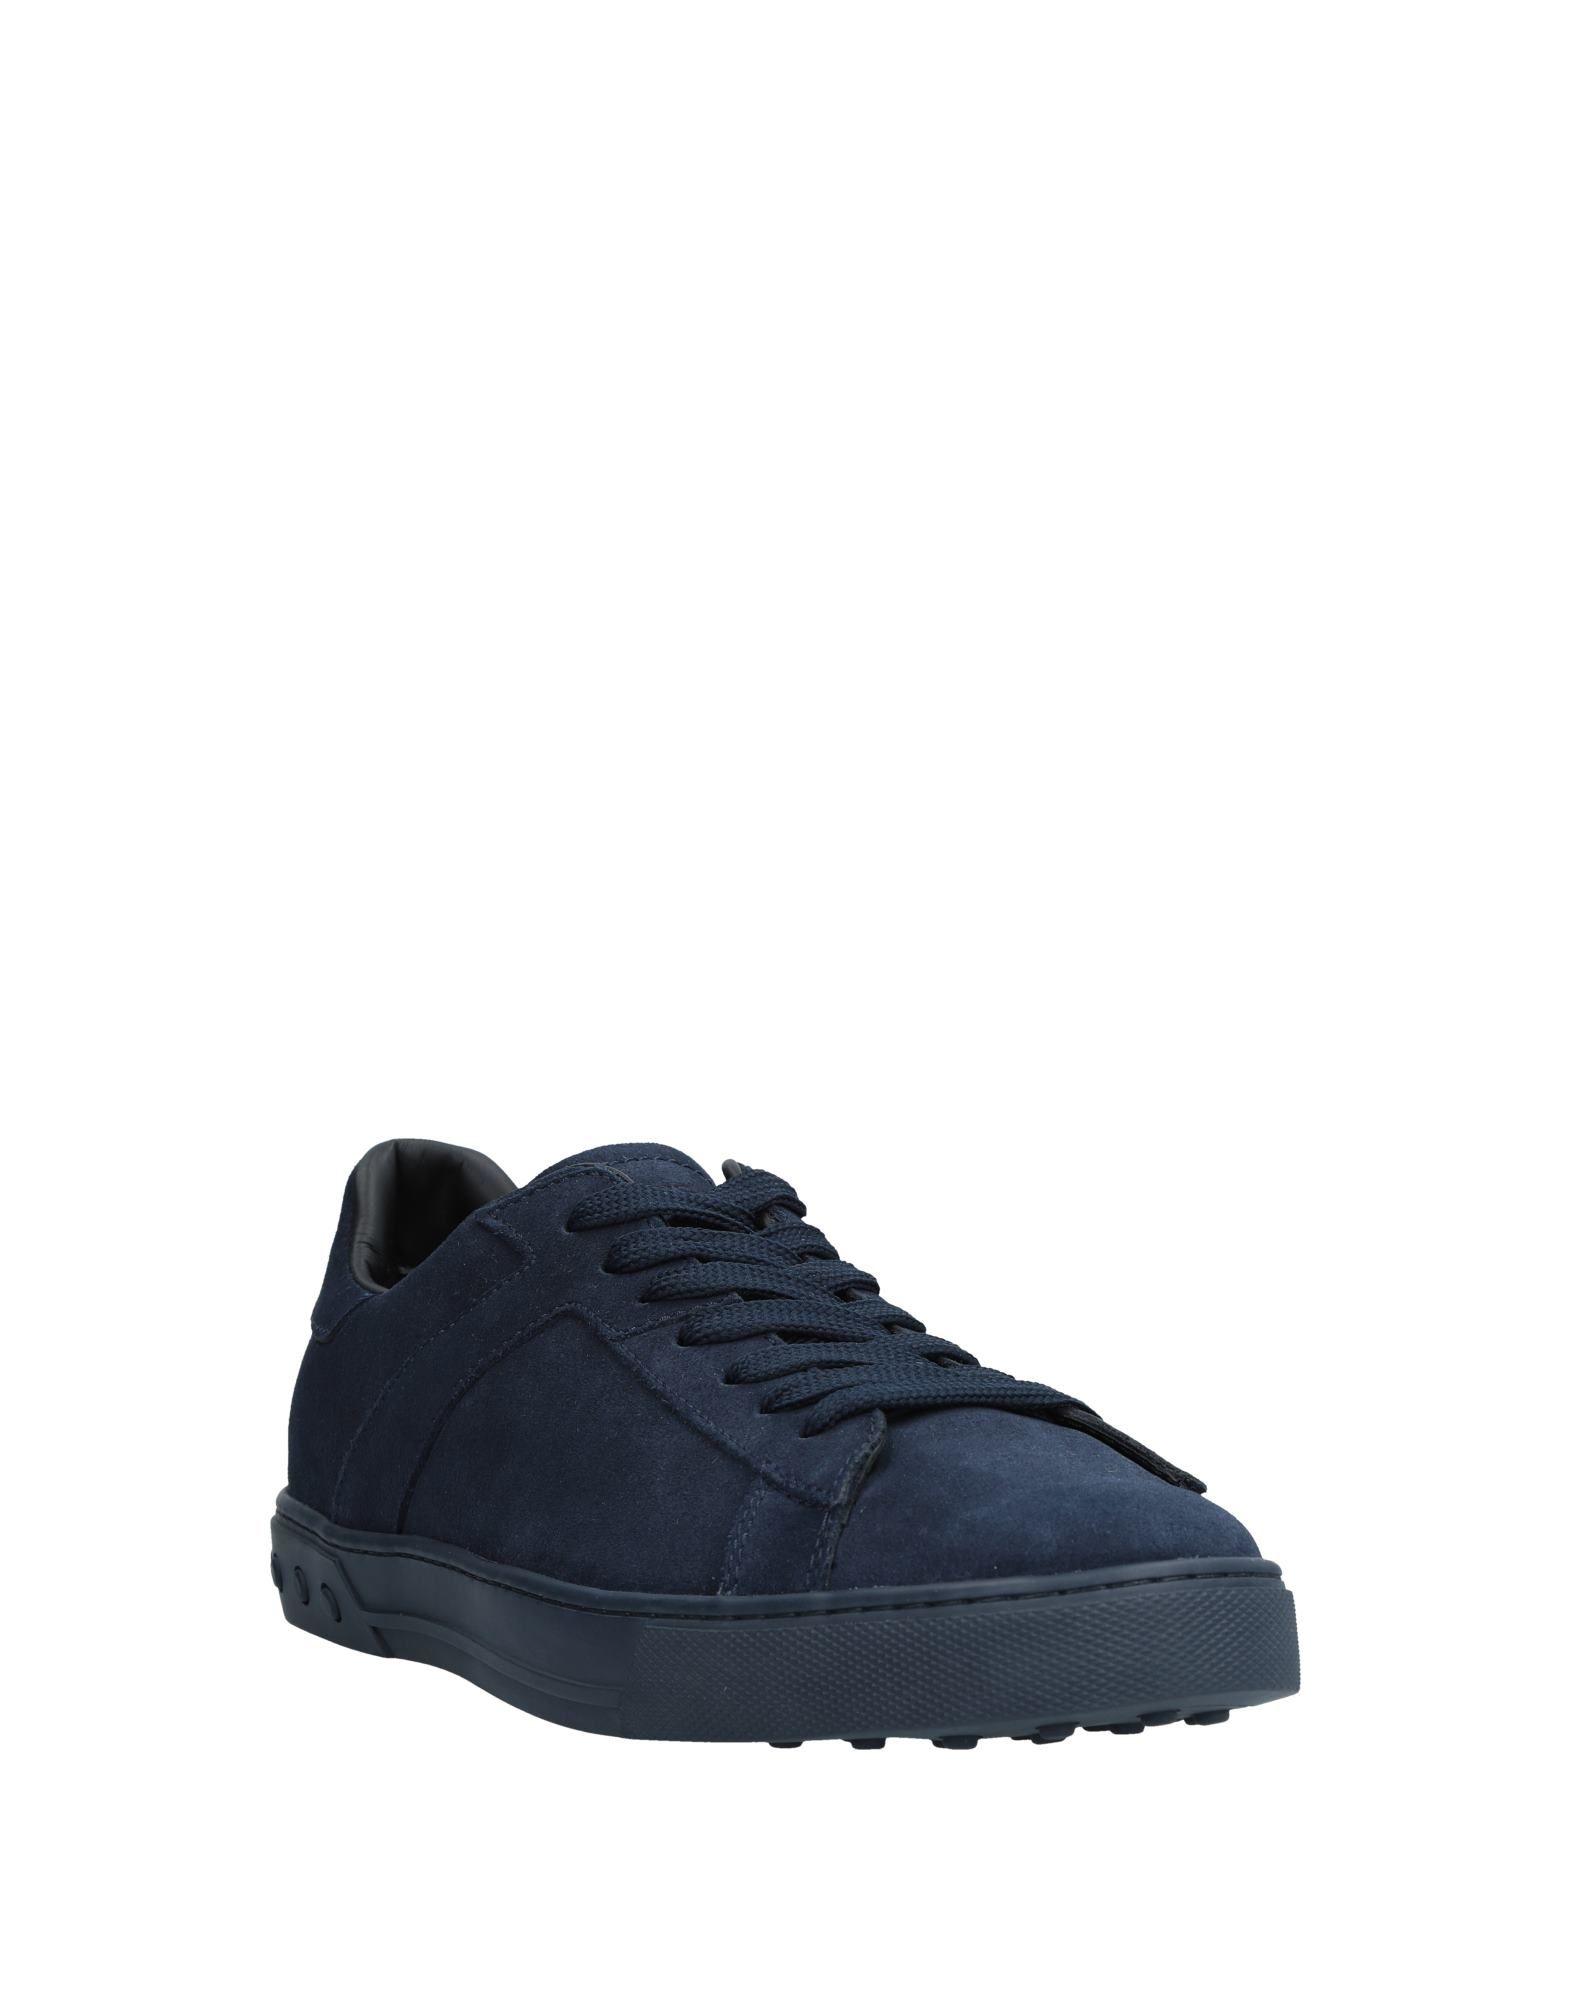 Tod's Sneakers Herren  11541816NV Gute Qualität beliebte Schuhe